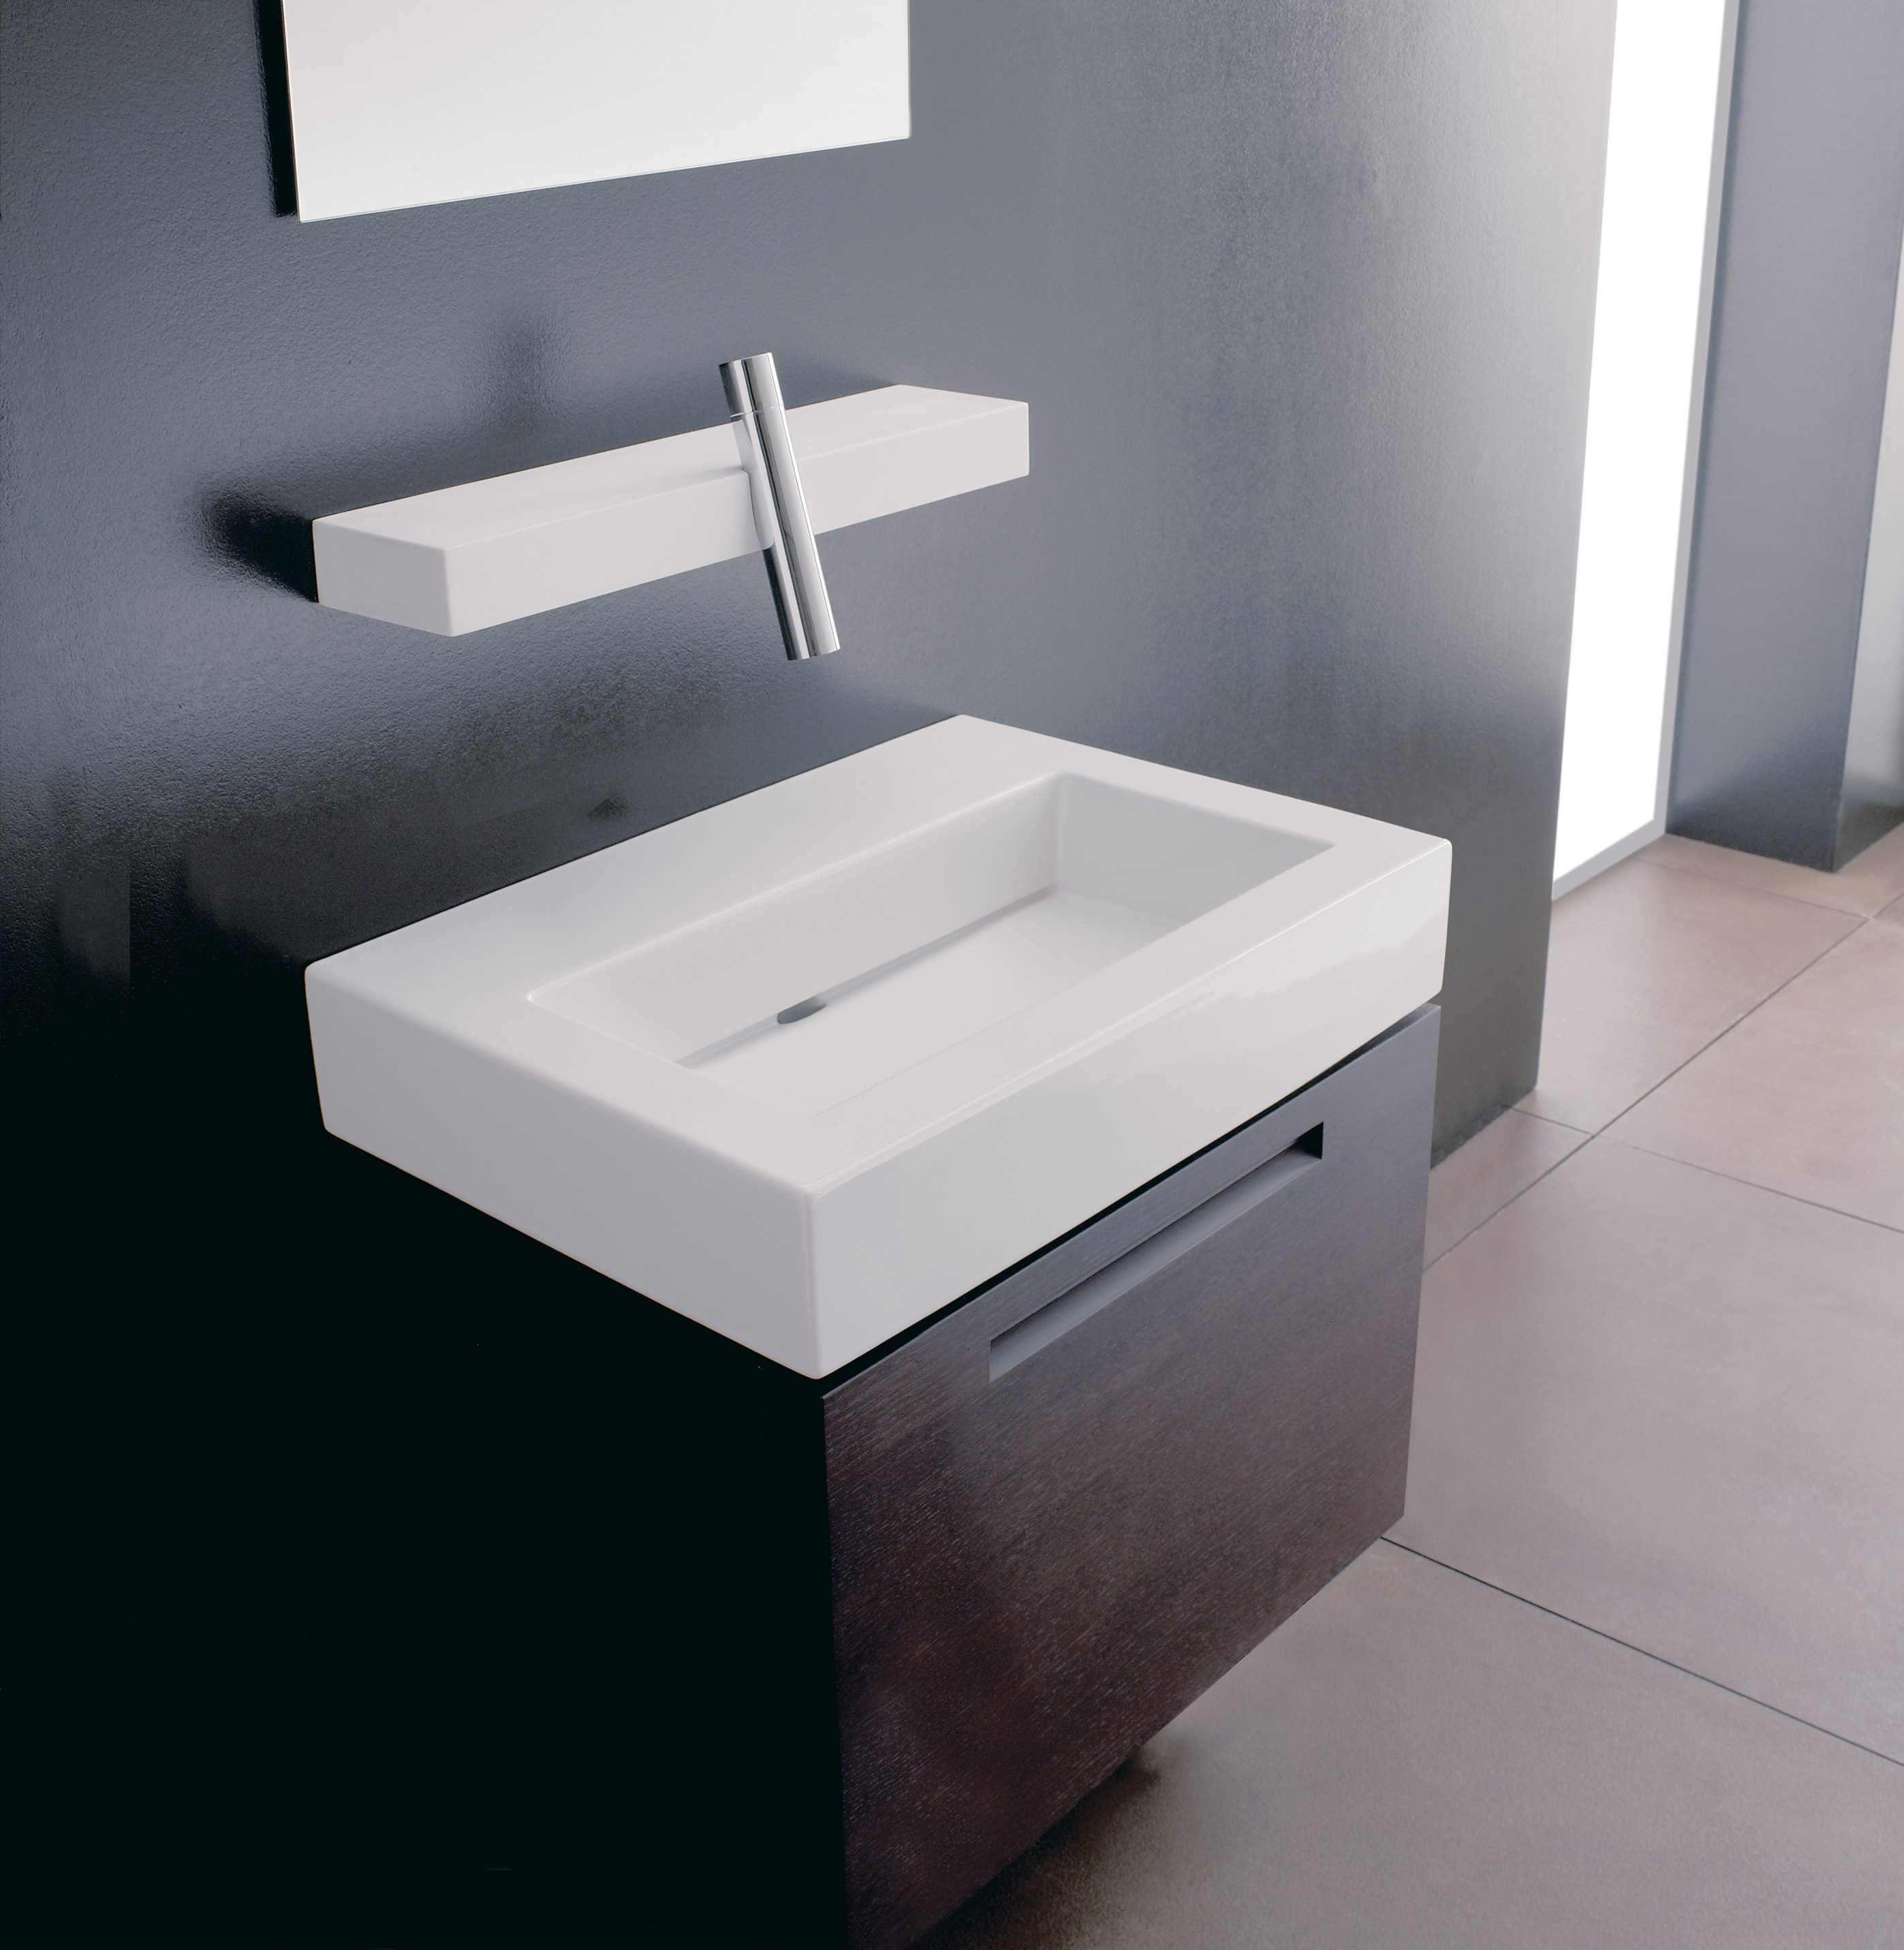 Blok mueble bajo lavabo by rubinetterie 3m dise o Diseno muebles de lavabo